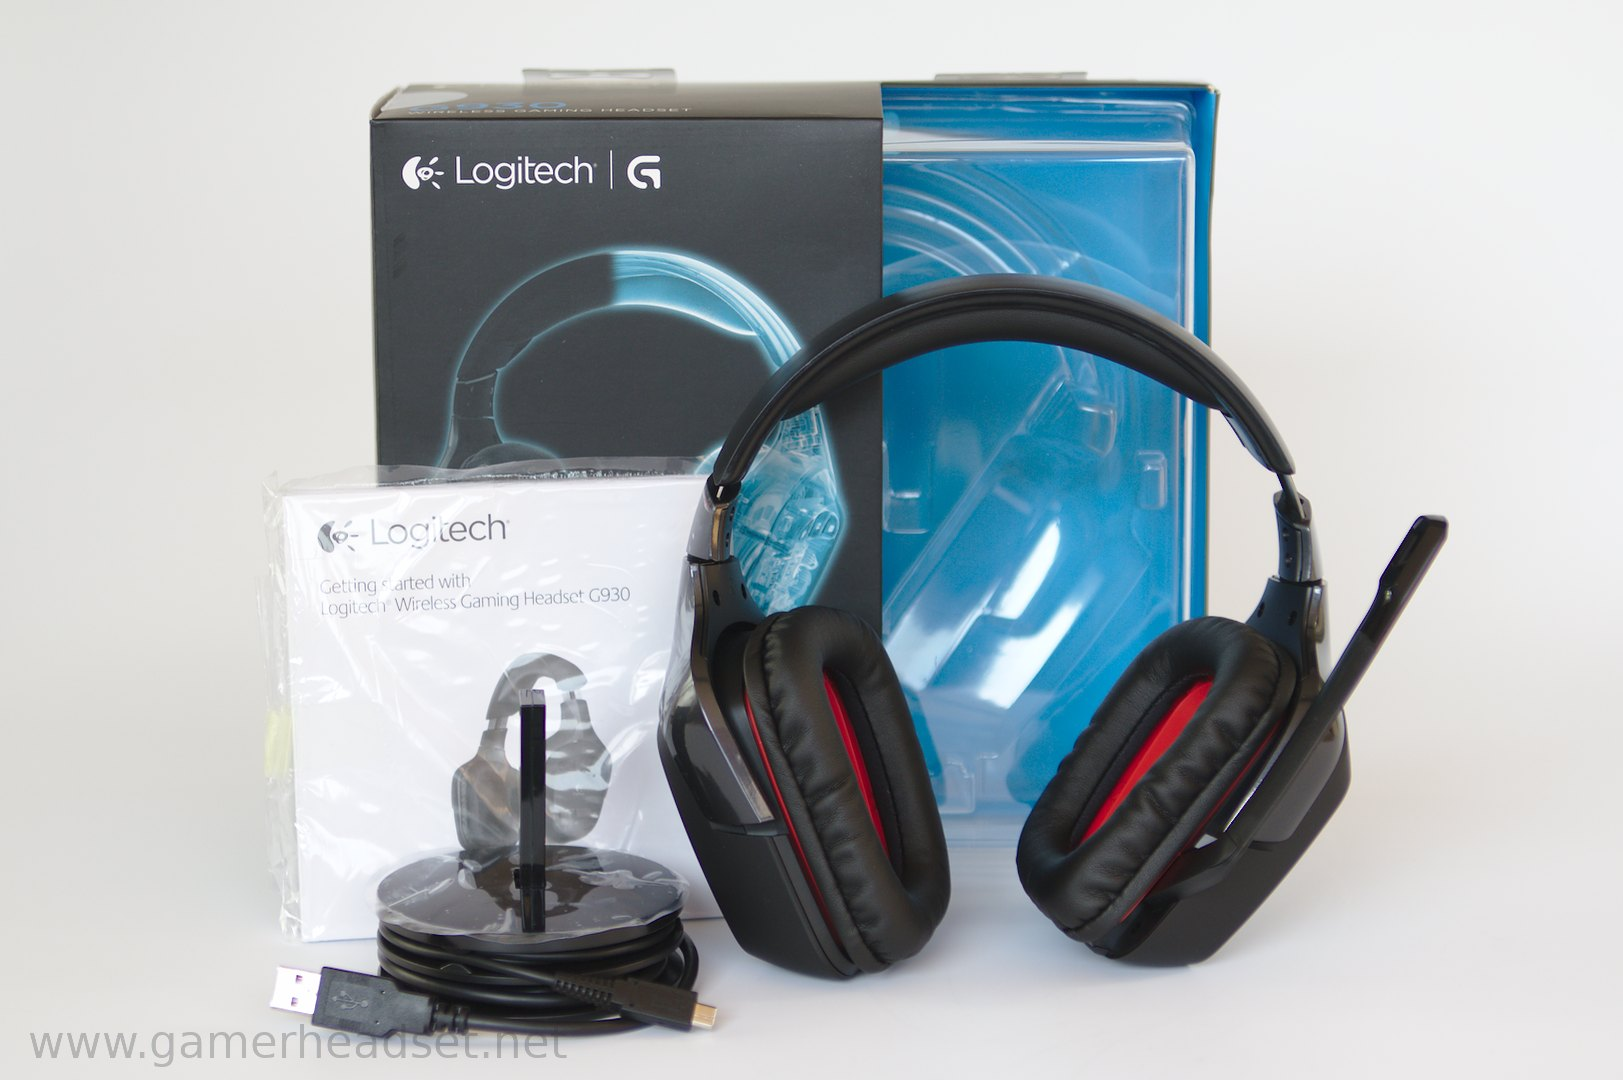 Logitech G930 wireless im Test | Gamer Headset